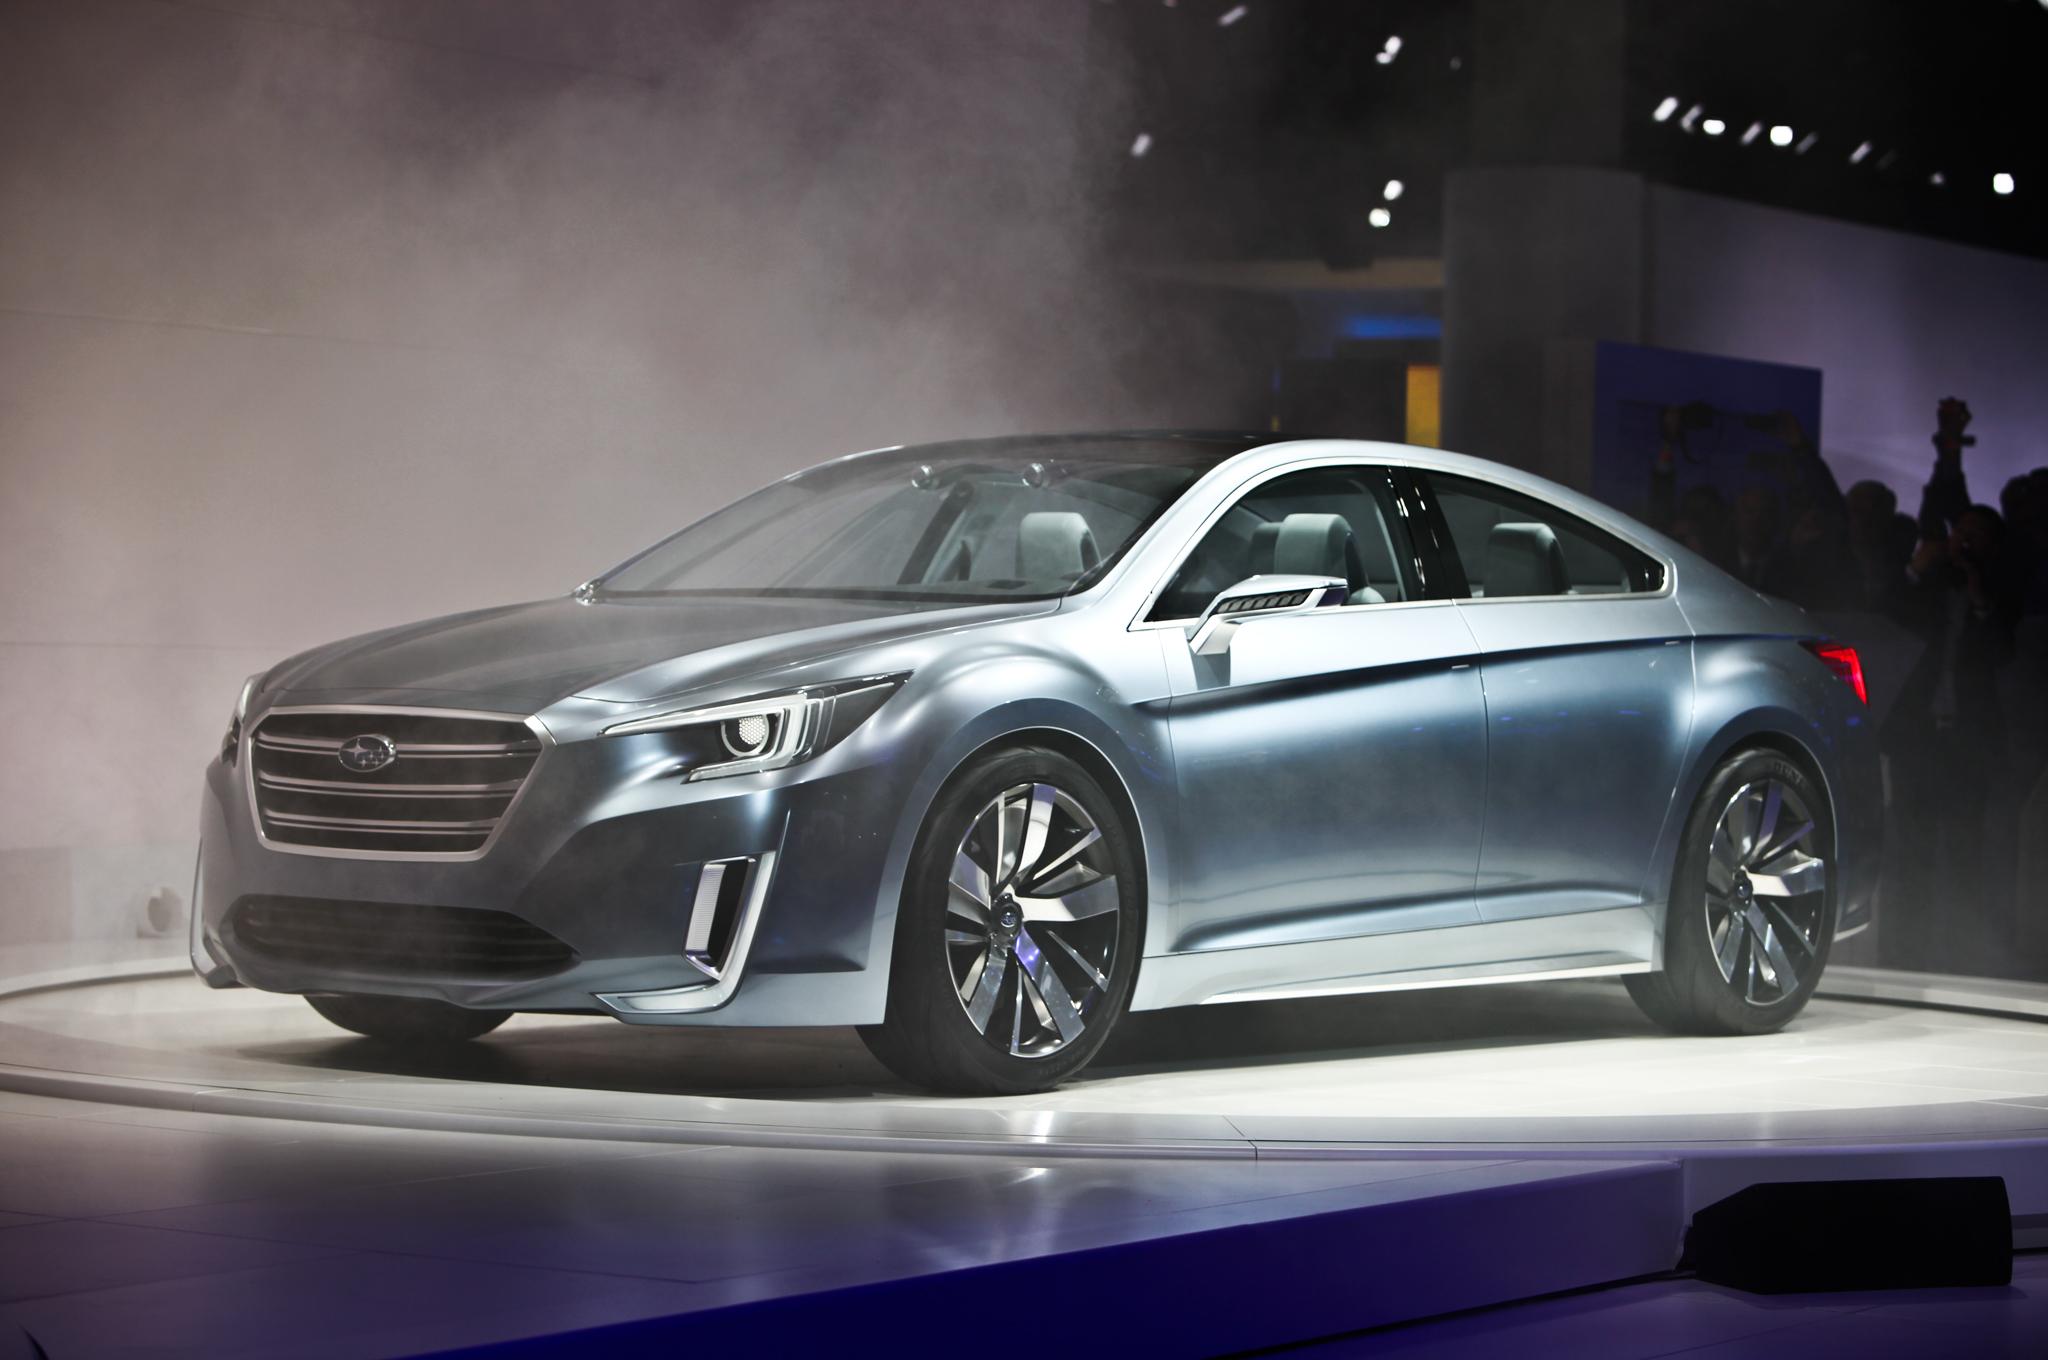 Cencept Cars: 2015 Subaru Legacy Concept